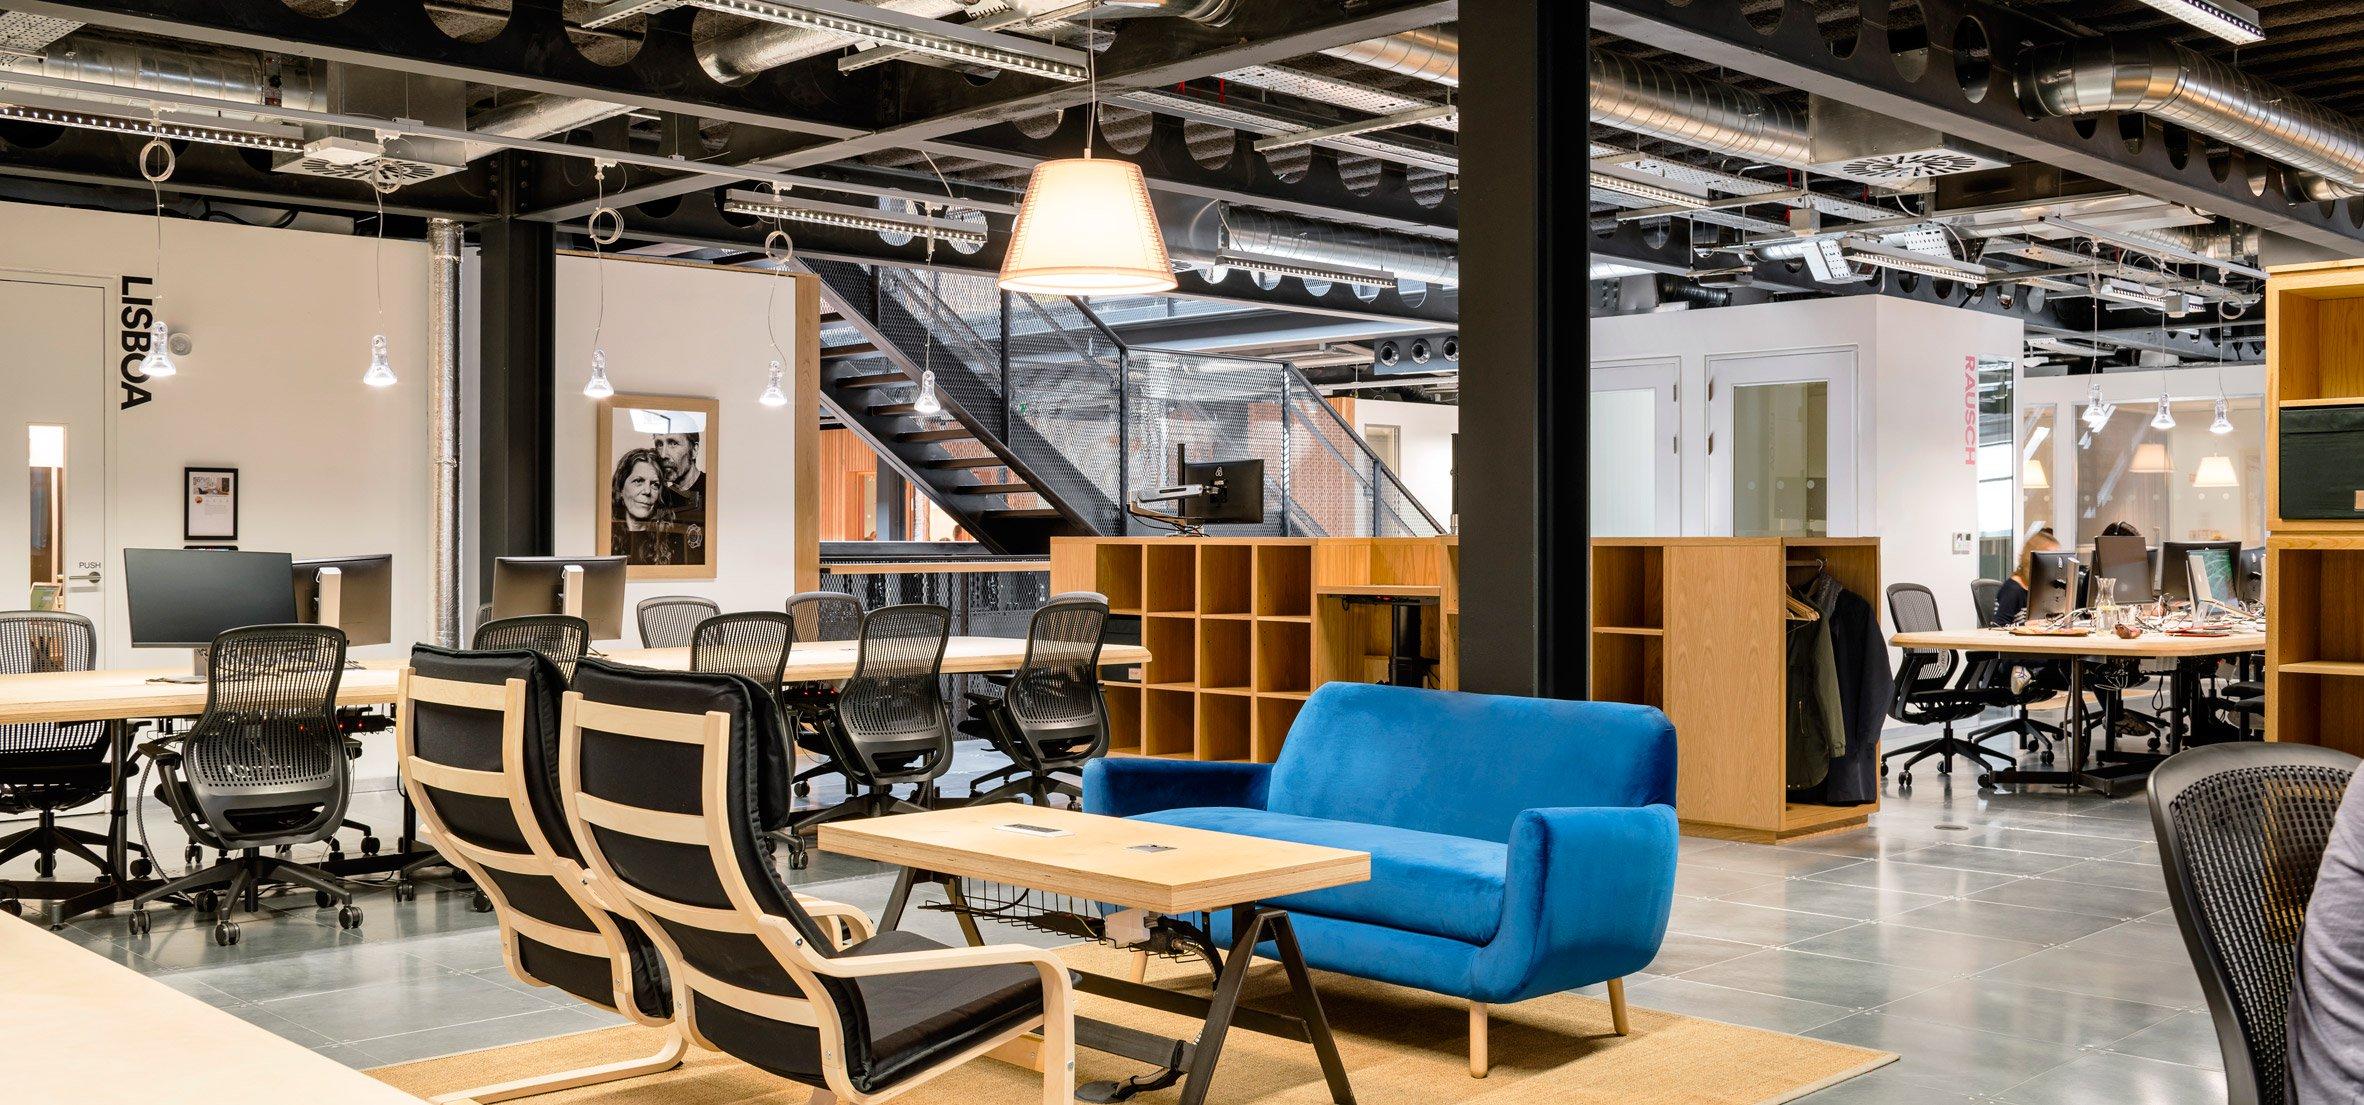 airbnb-dublin-office-interiors-ireland-offices_dezeen_2364_col_2